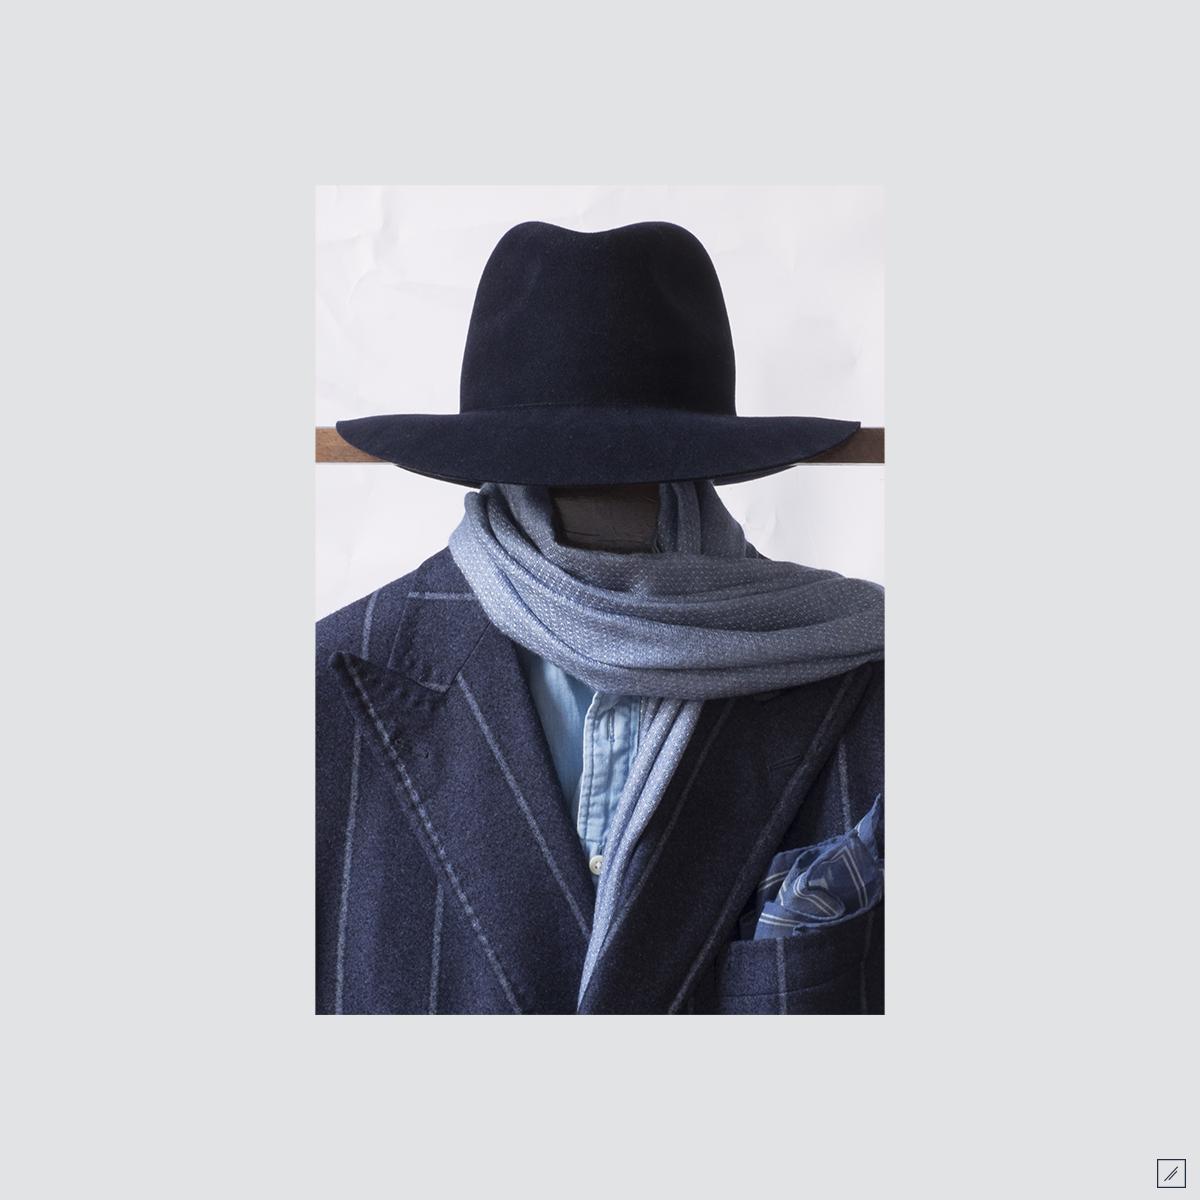 la-stoffa :     Blu    Hat - Rabbit felt rollable     Woven scarf - Double sided reverse pin dot     Pocket square - Diamond tiles on a bias